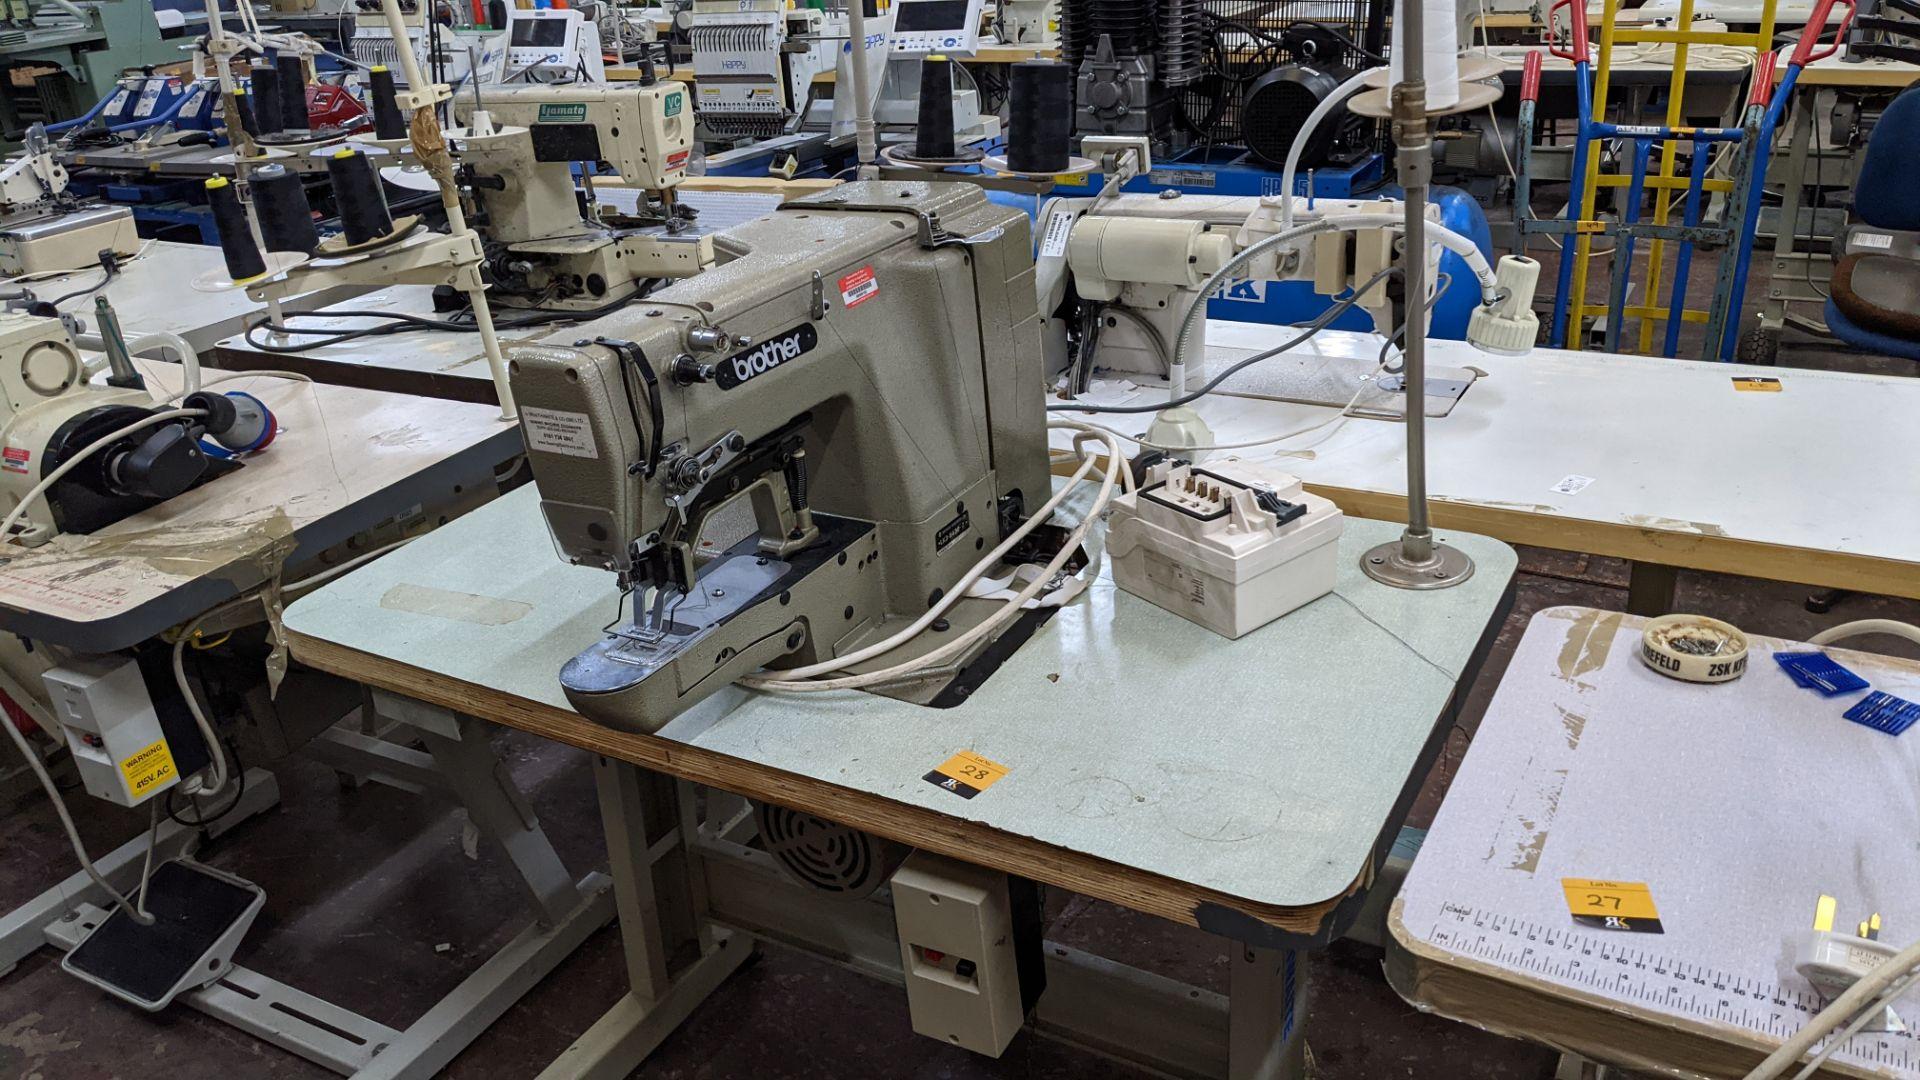 Brother bar tack sewing machine model LK3-B430-2